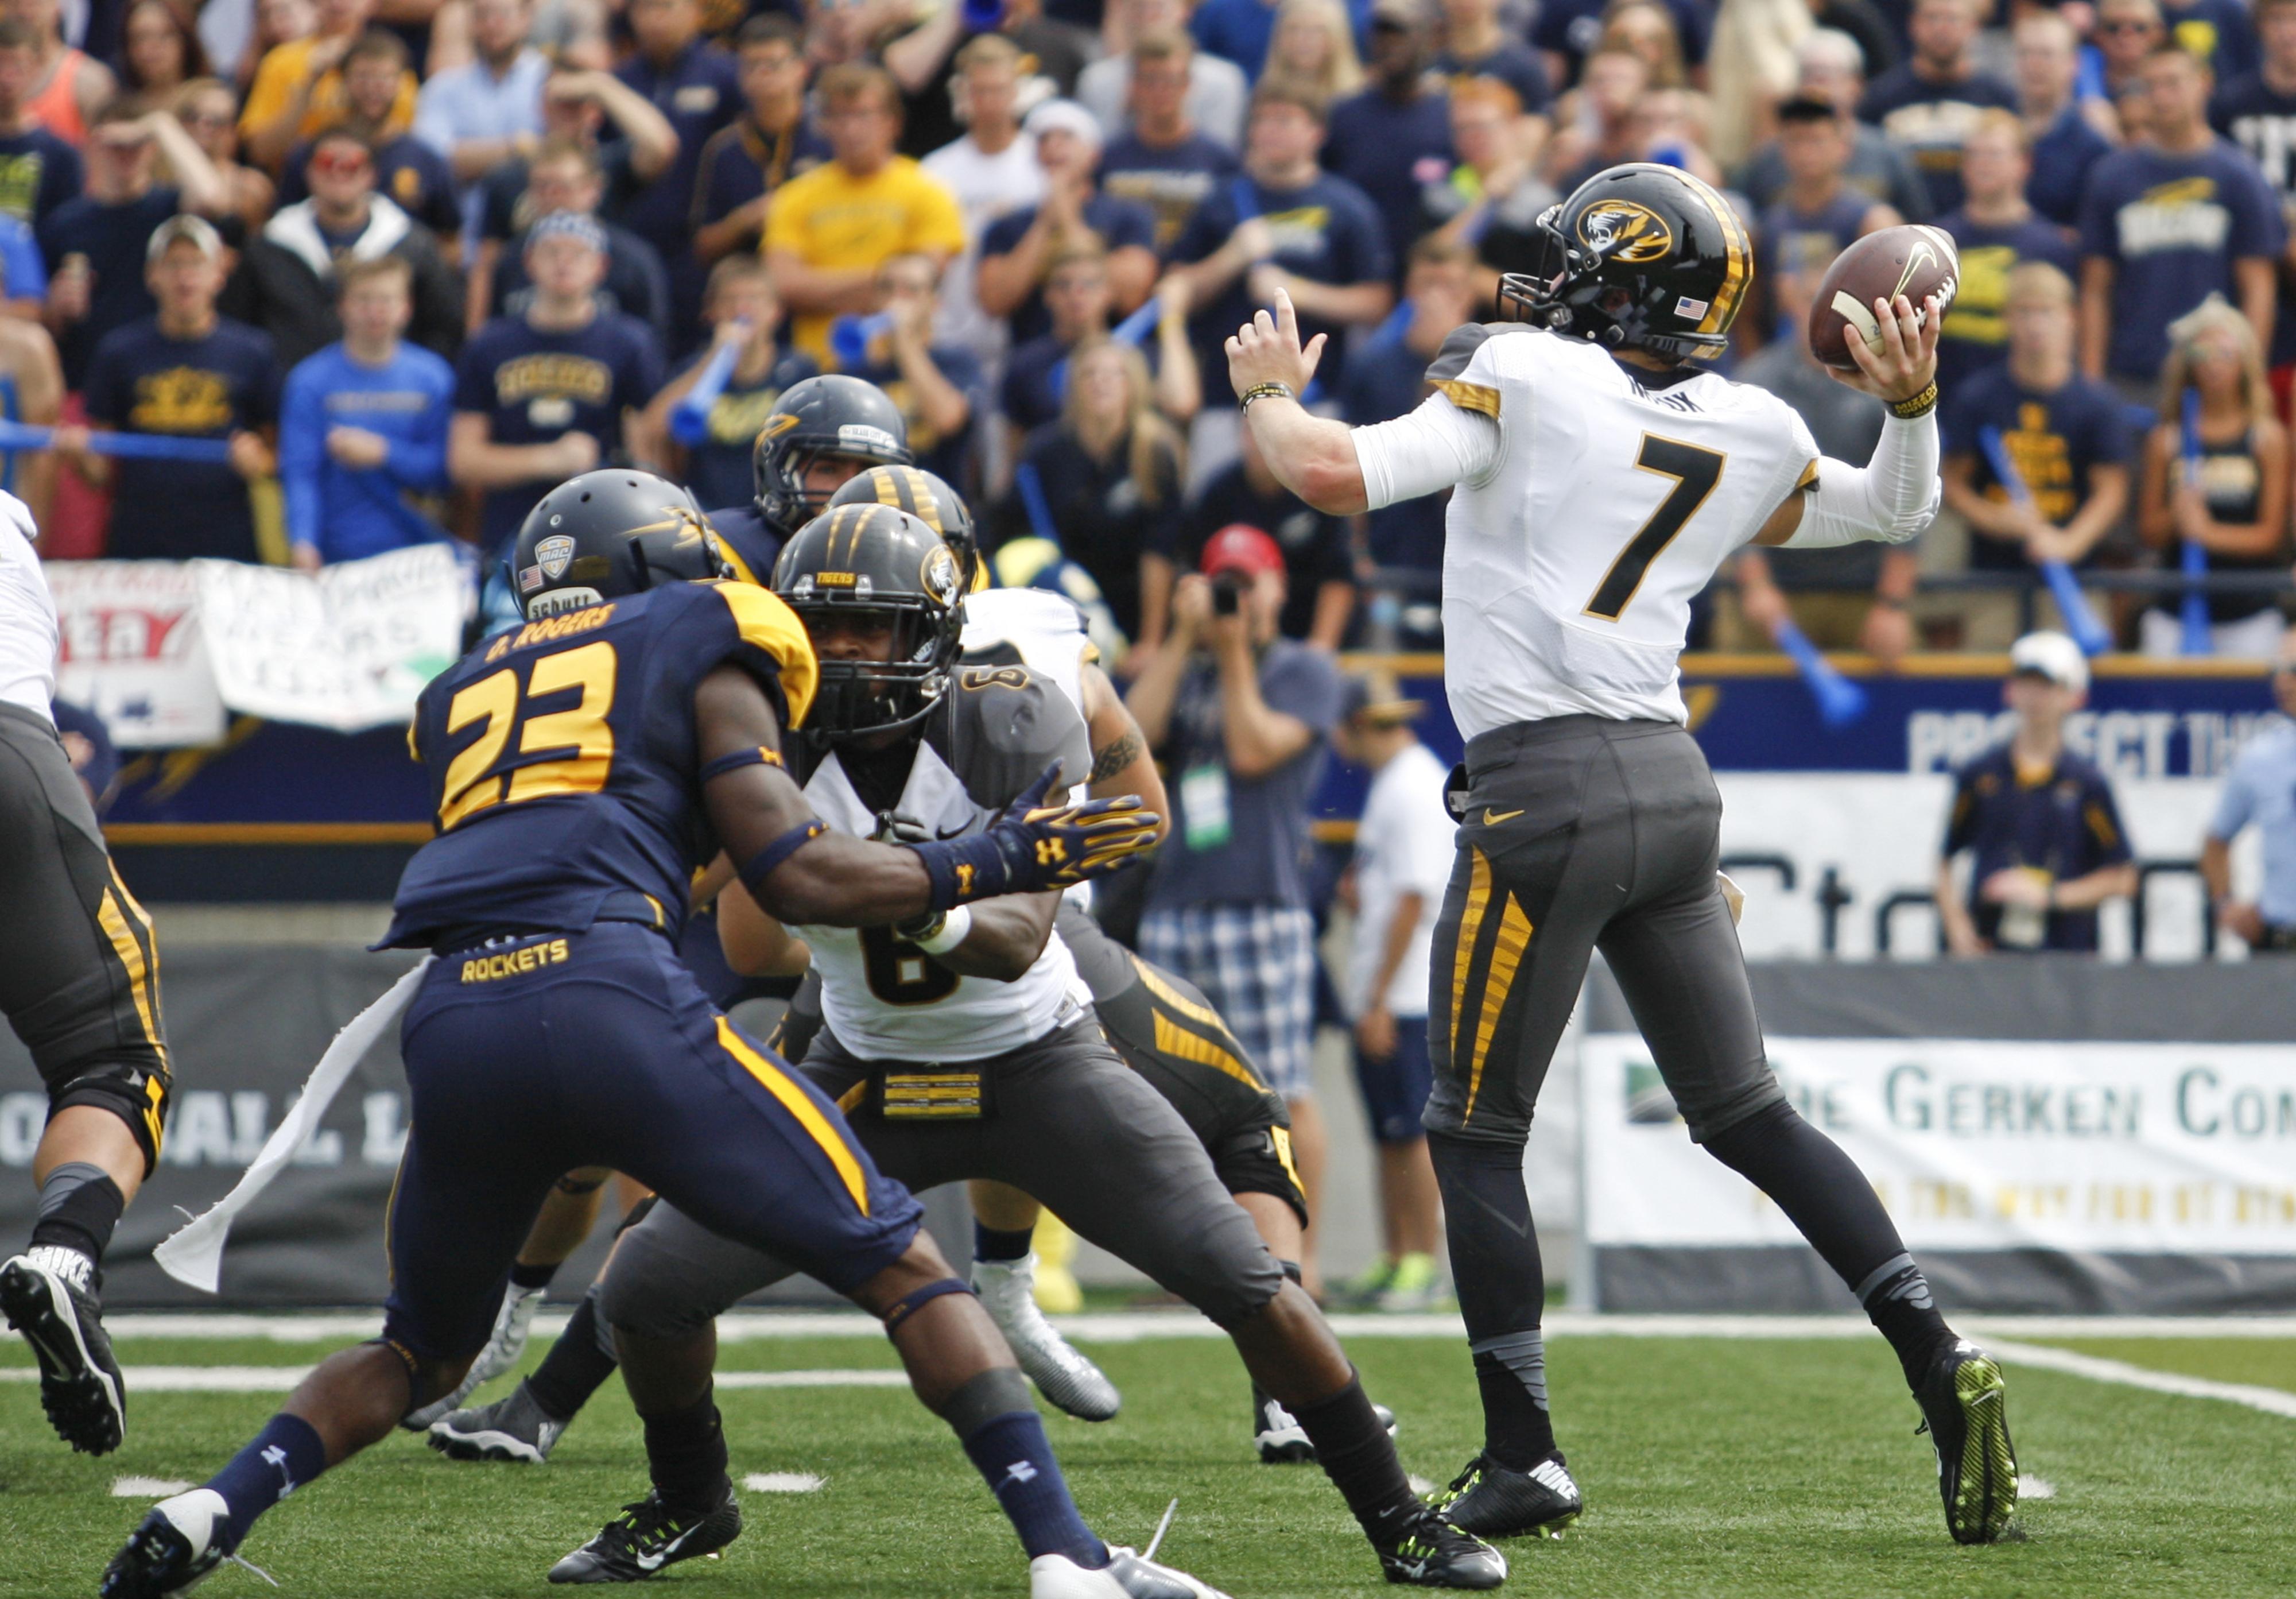 Maty Mauk threw for 5 touchdowns vs Toledo, tying a school record